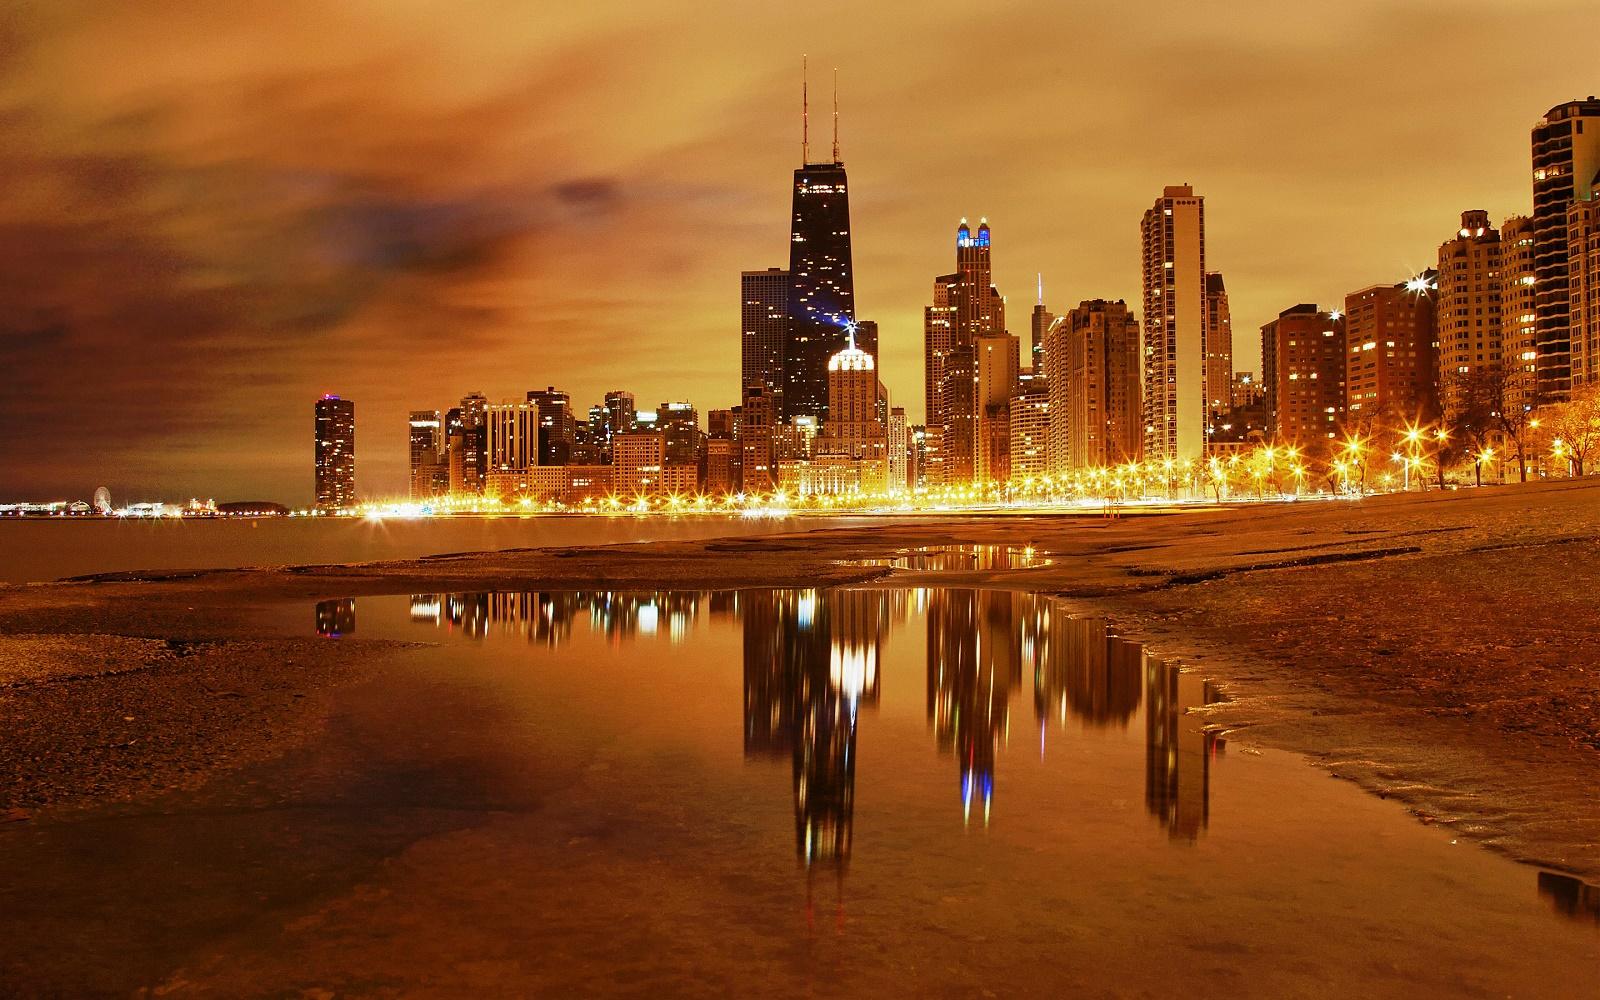 Download Wallpaper Night Beauty - Chicago_Illinois_Skyline_Amazing_Beauty_At_Night_USA_HD_Desktop_Wallpaper_citiesoflove  Pic.jpg